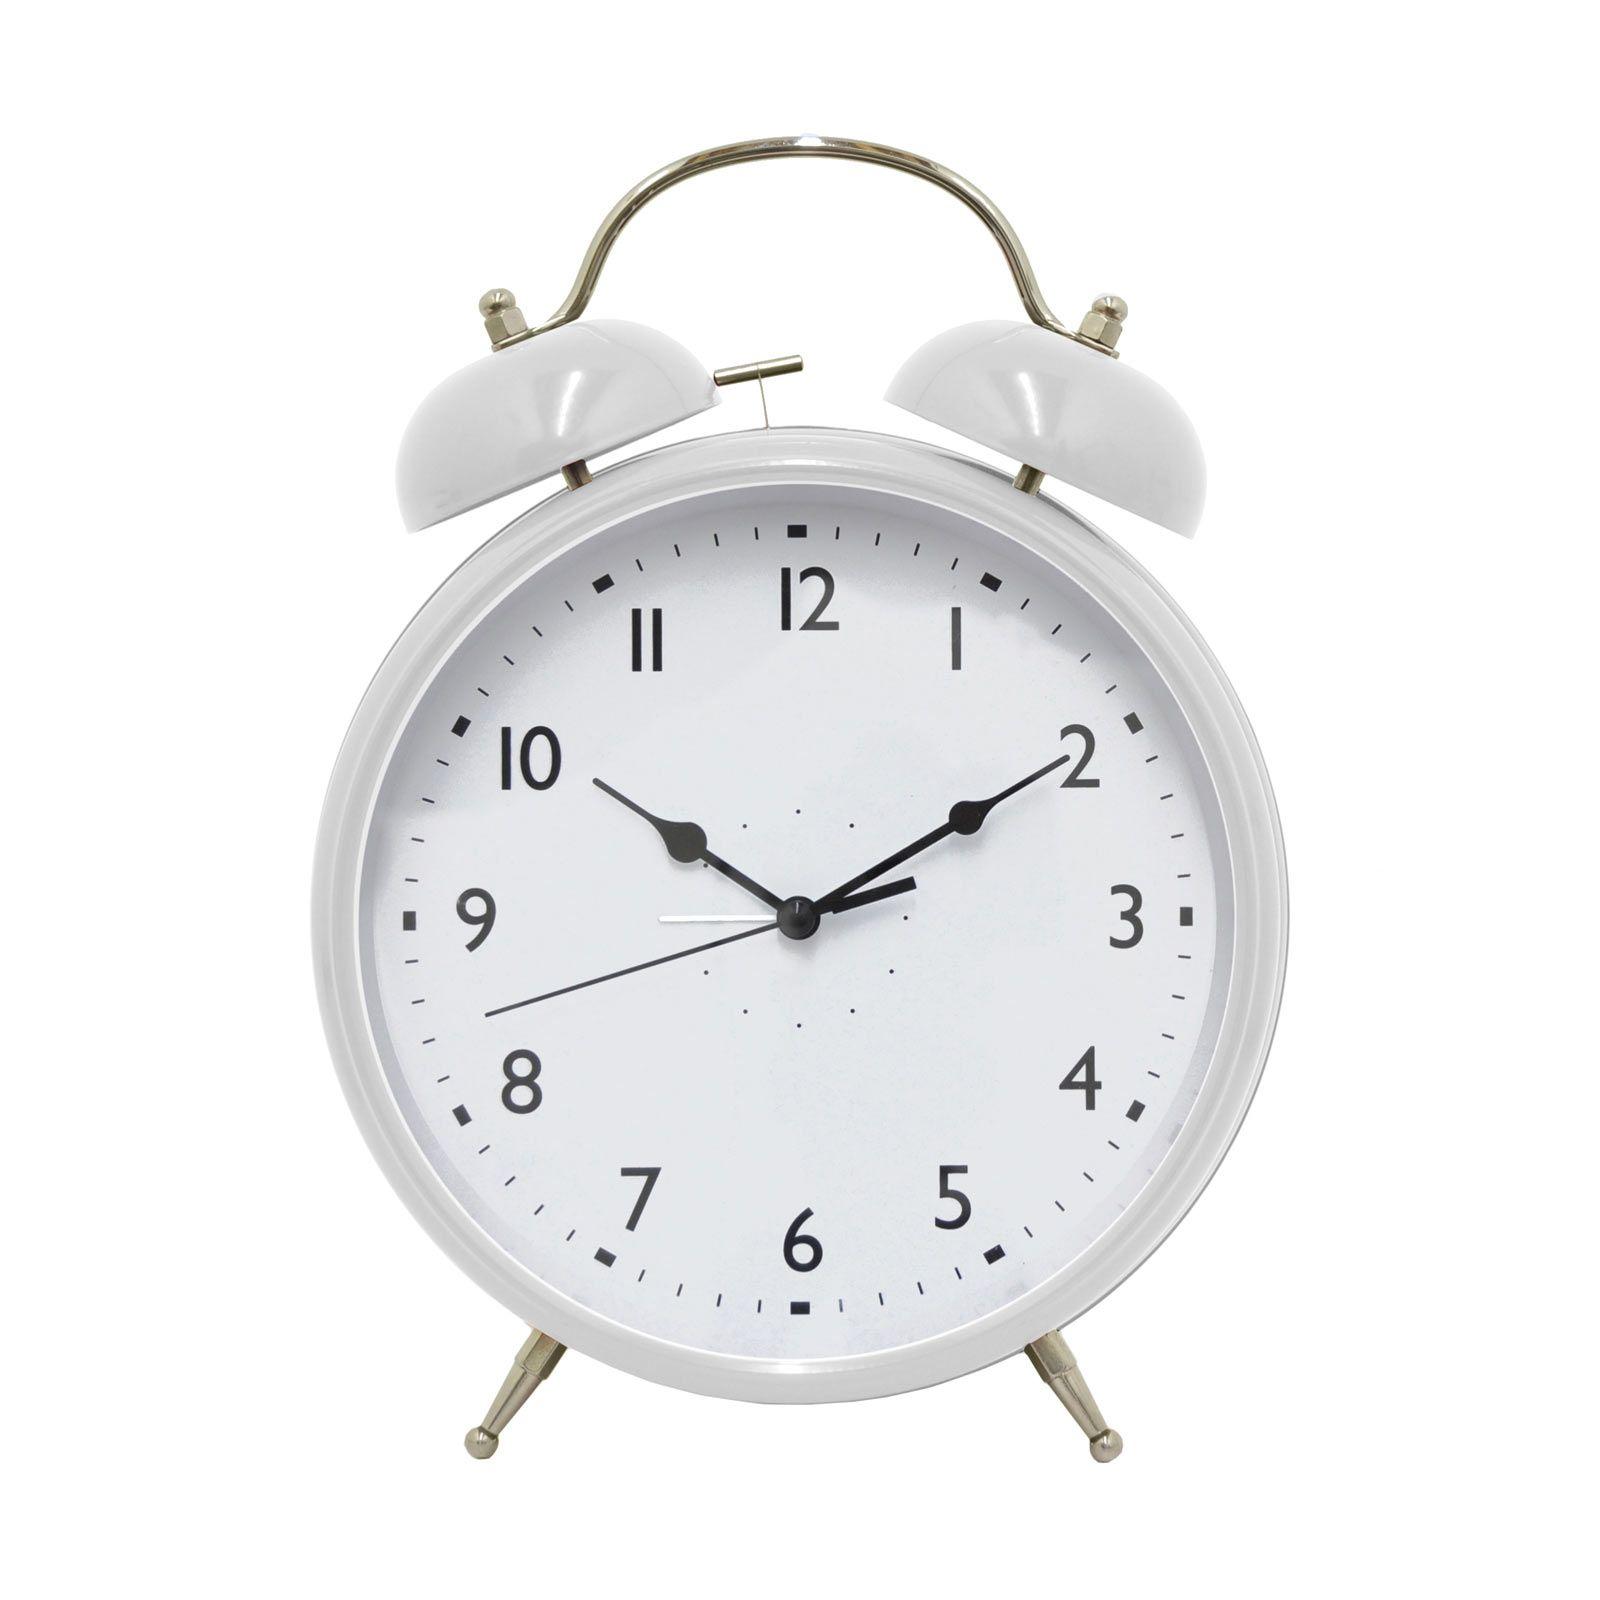 Old Style White Alarm Clock 시계 아이콘